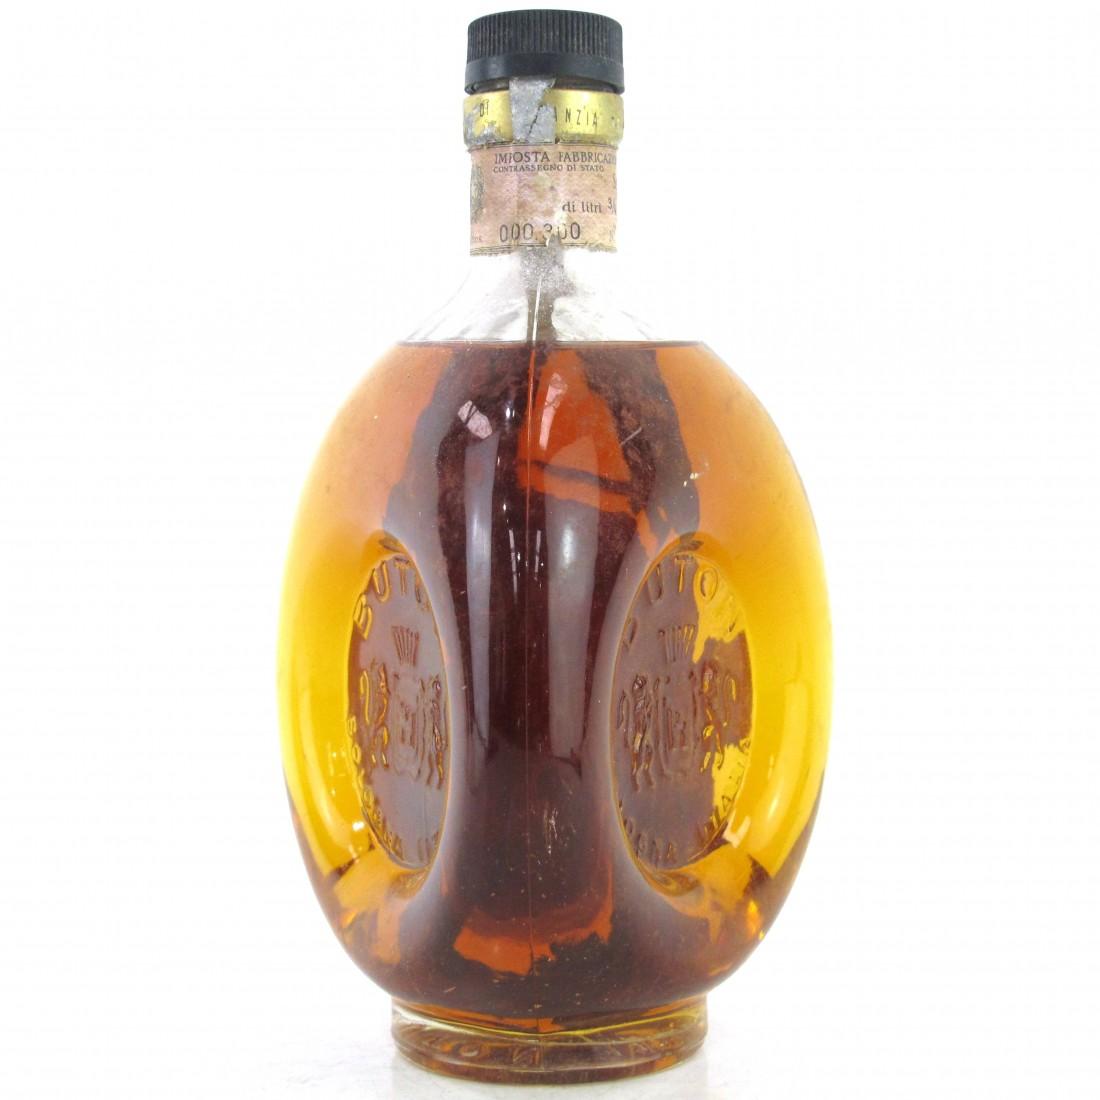 Buton Vecchia Romagna '1820' Rirerva Brandy 1960s